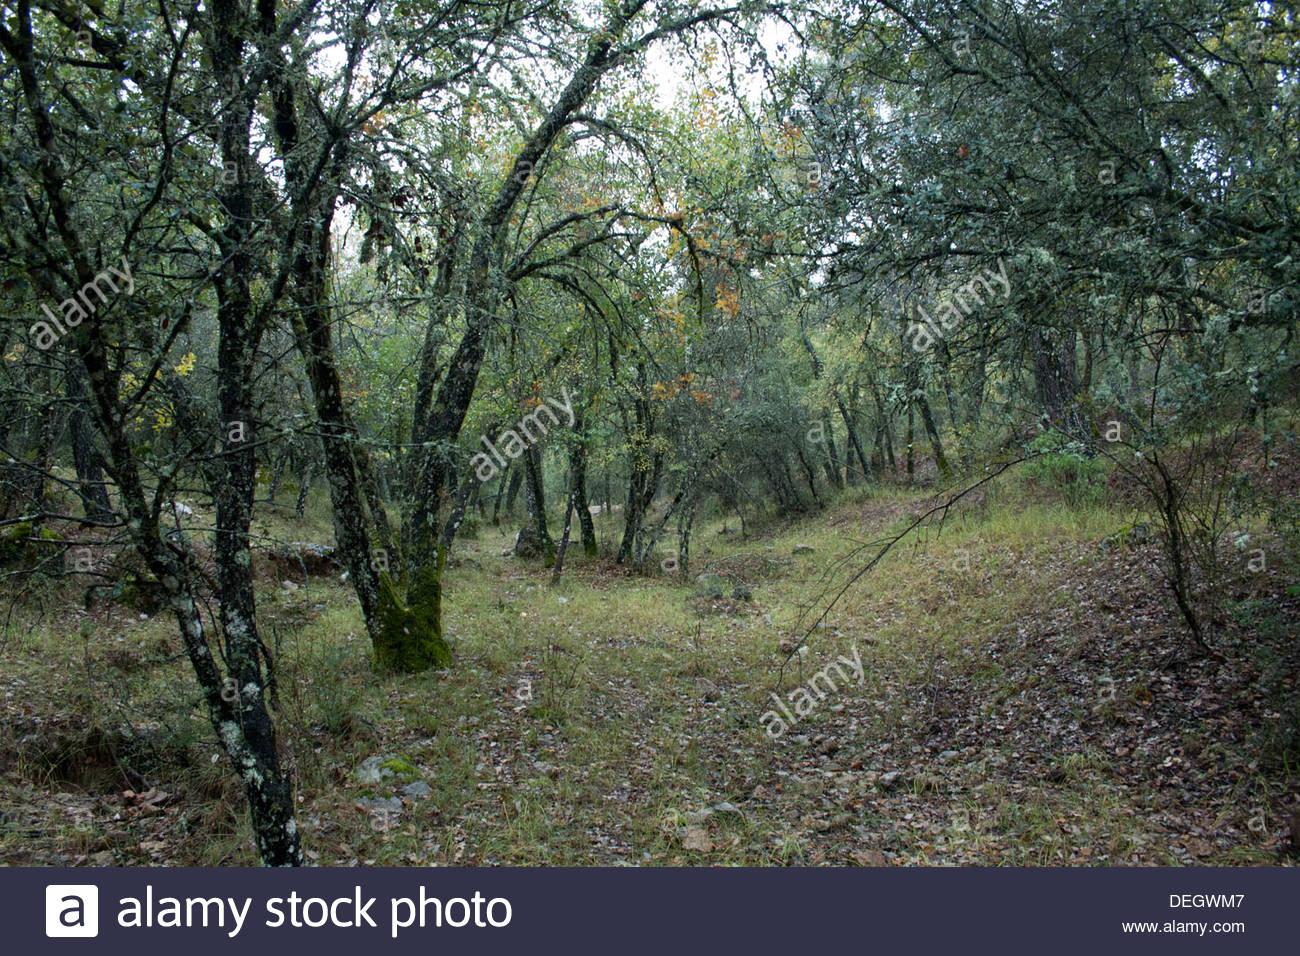 Forest Landscape at Sierra de Cazorla, Segura y Las Villas National Park, in Jaen, Andalucia, Spain. Stock Photo